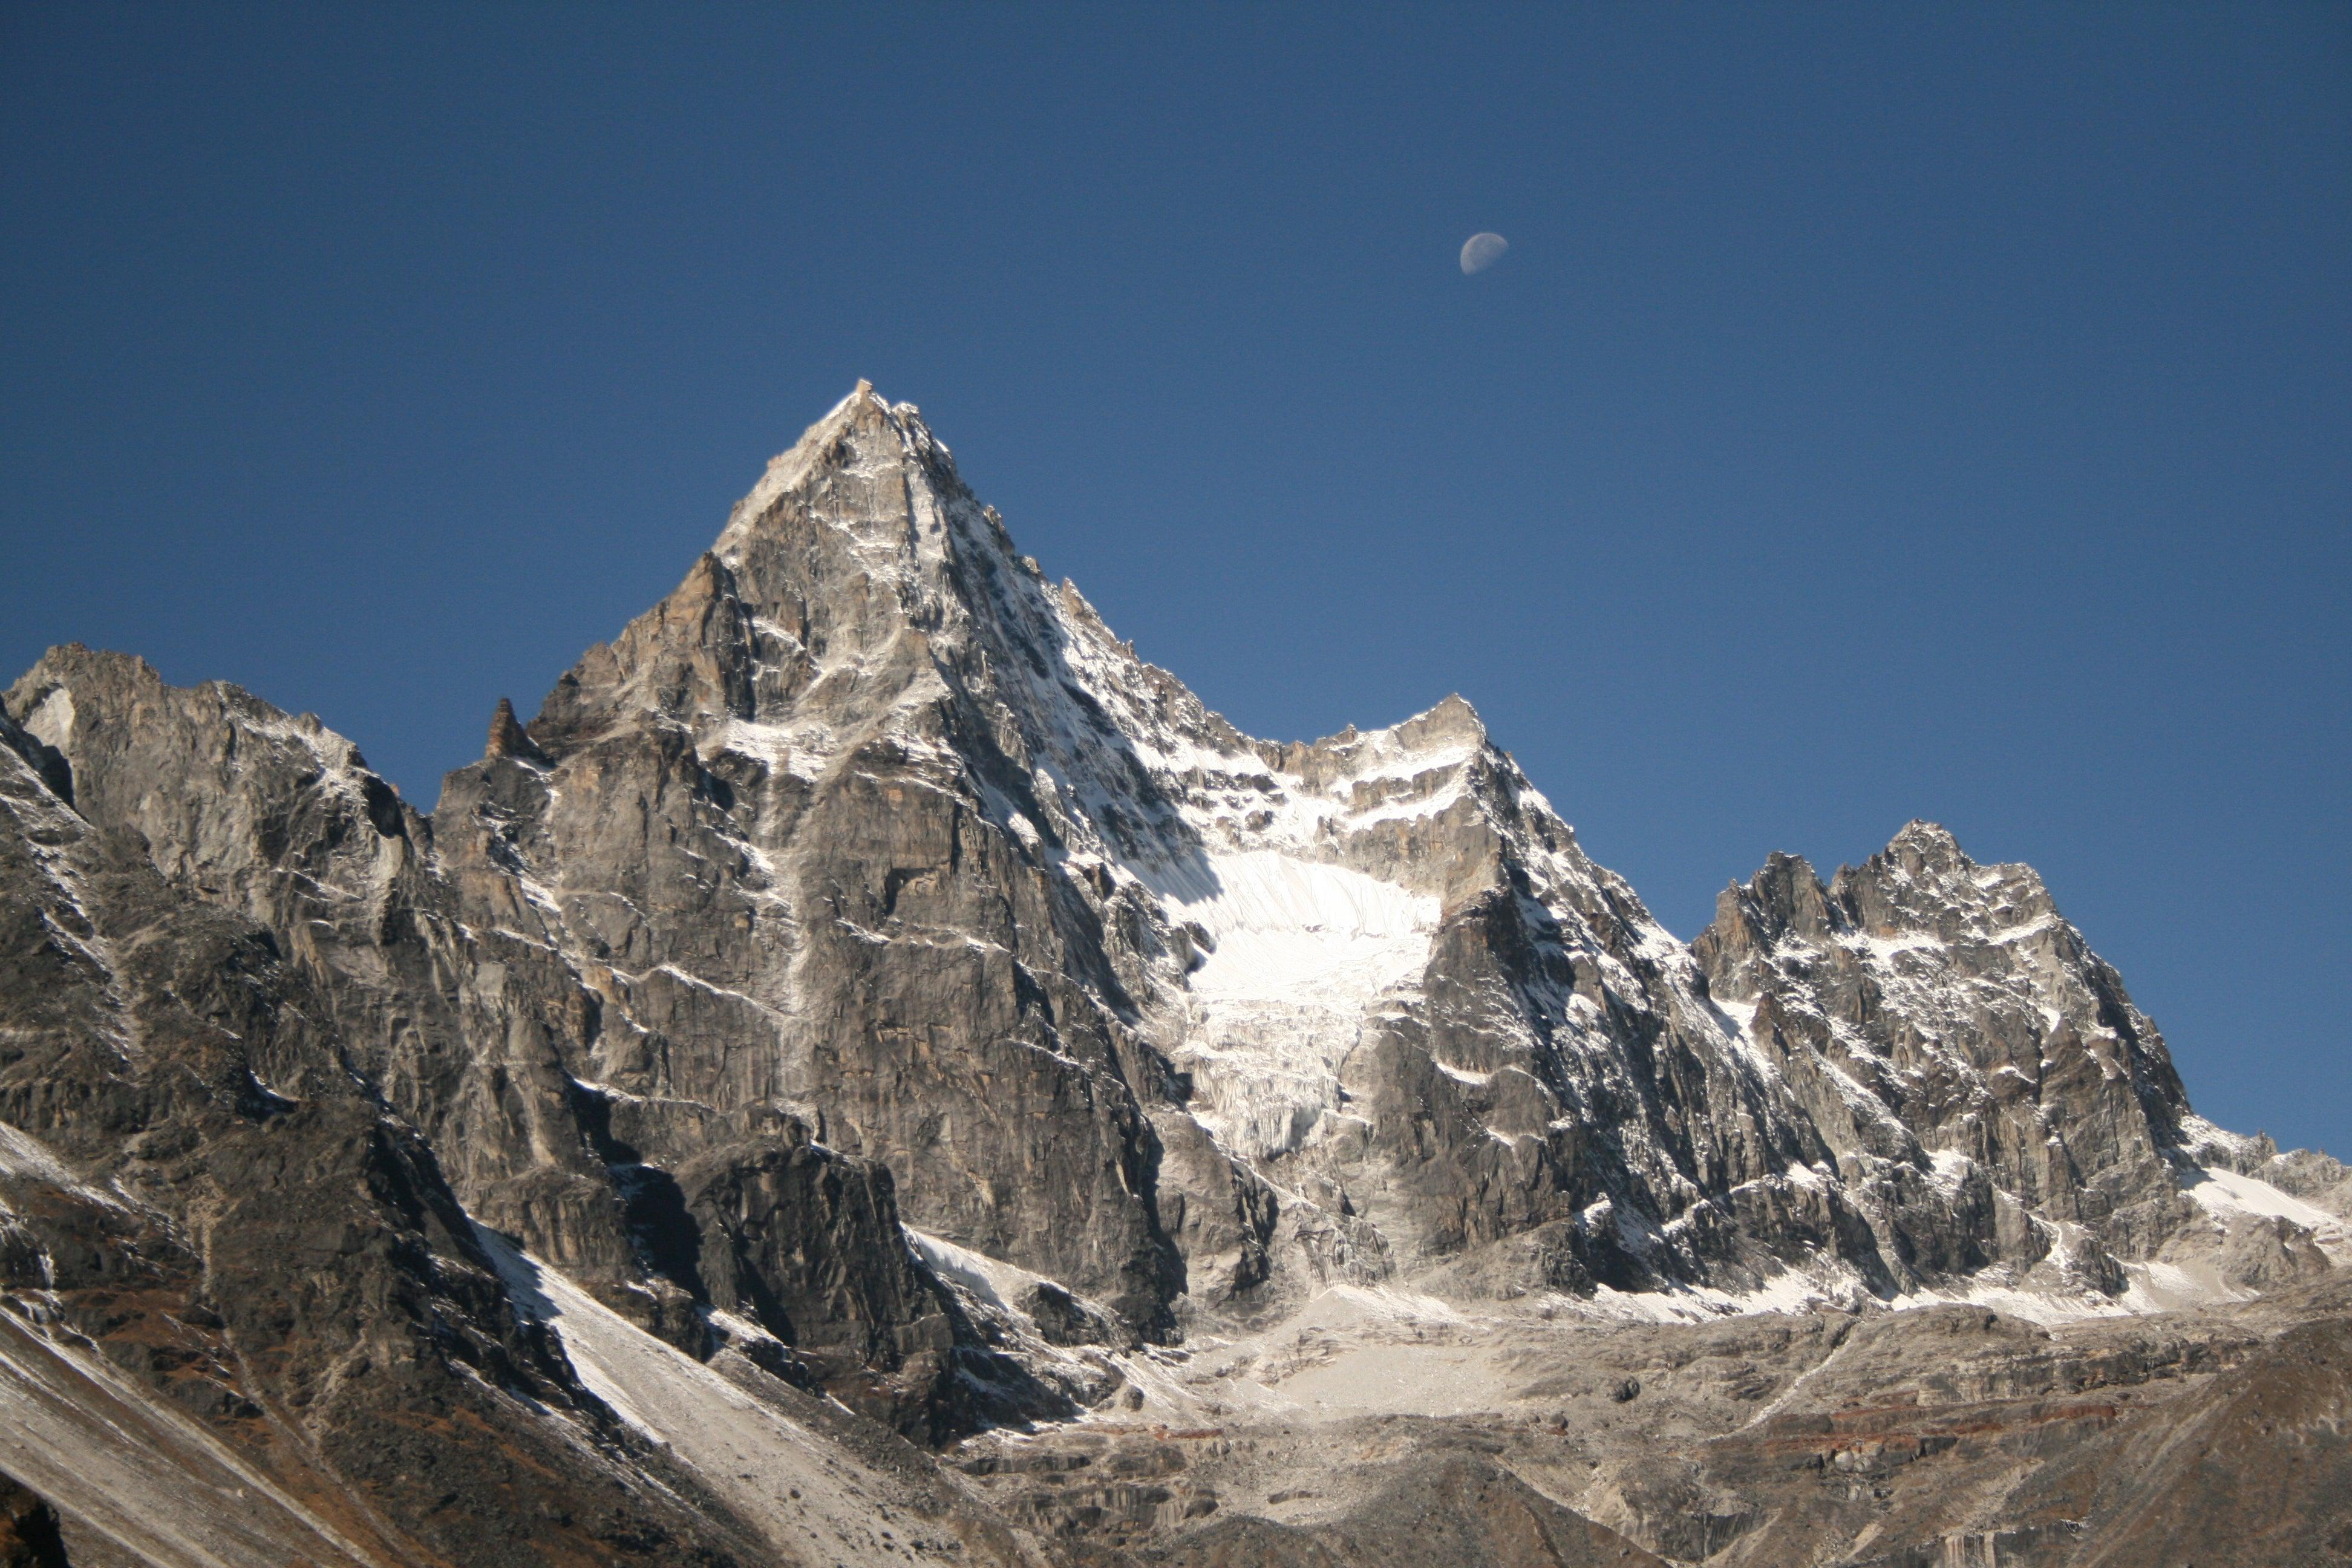 Into the Khumbu: Elusive Nepal